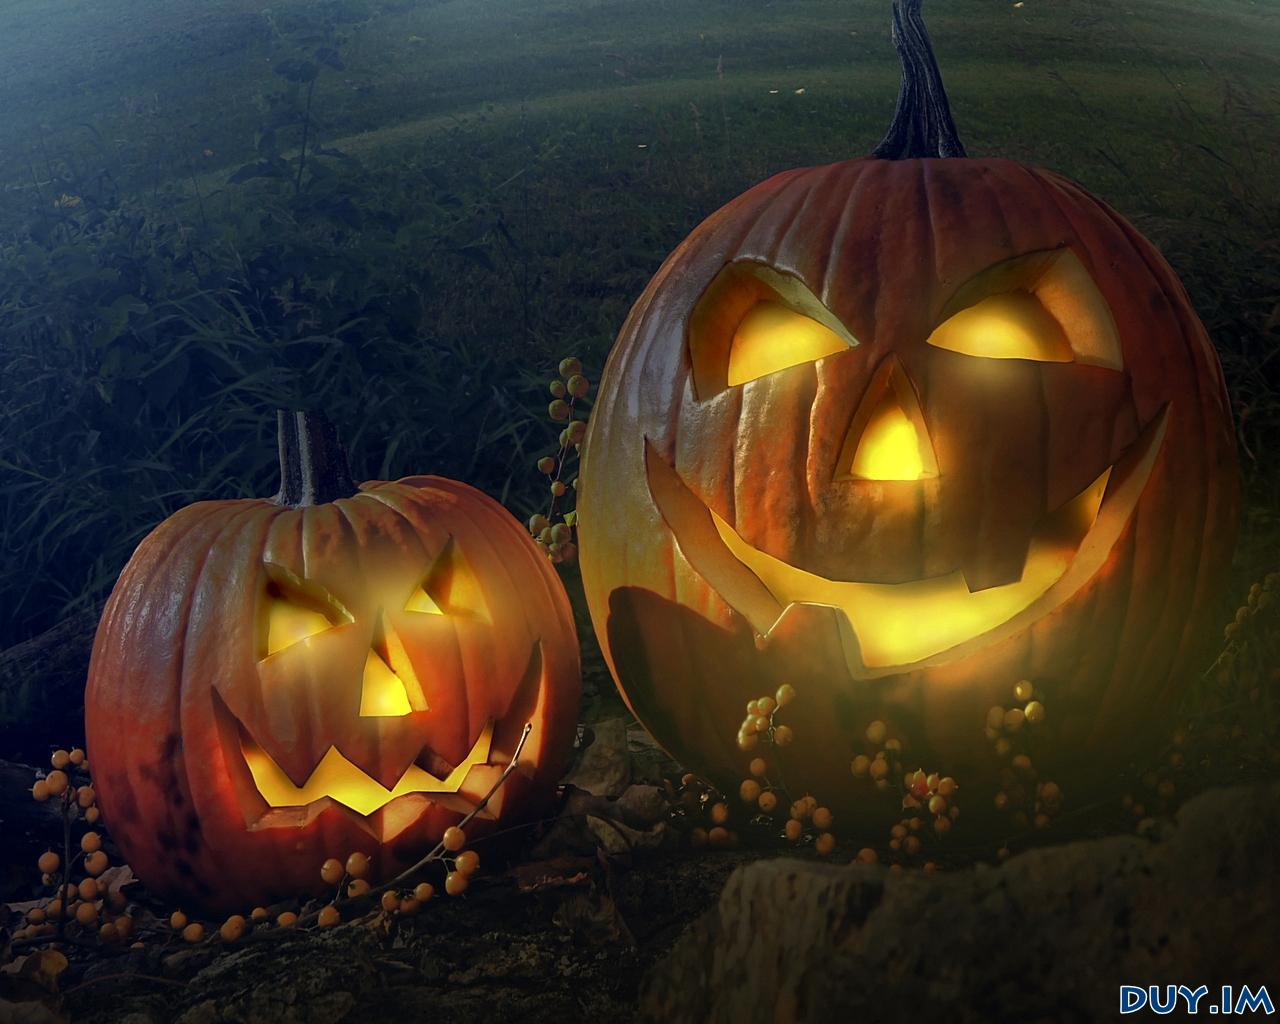 73] Funny Halloween Wallpaper on WallpaperSafari 1280x1024